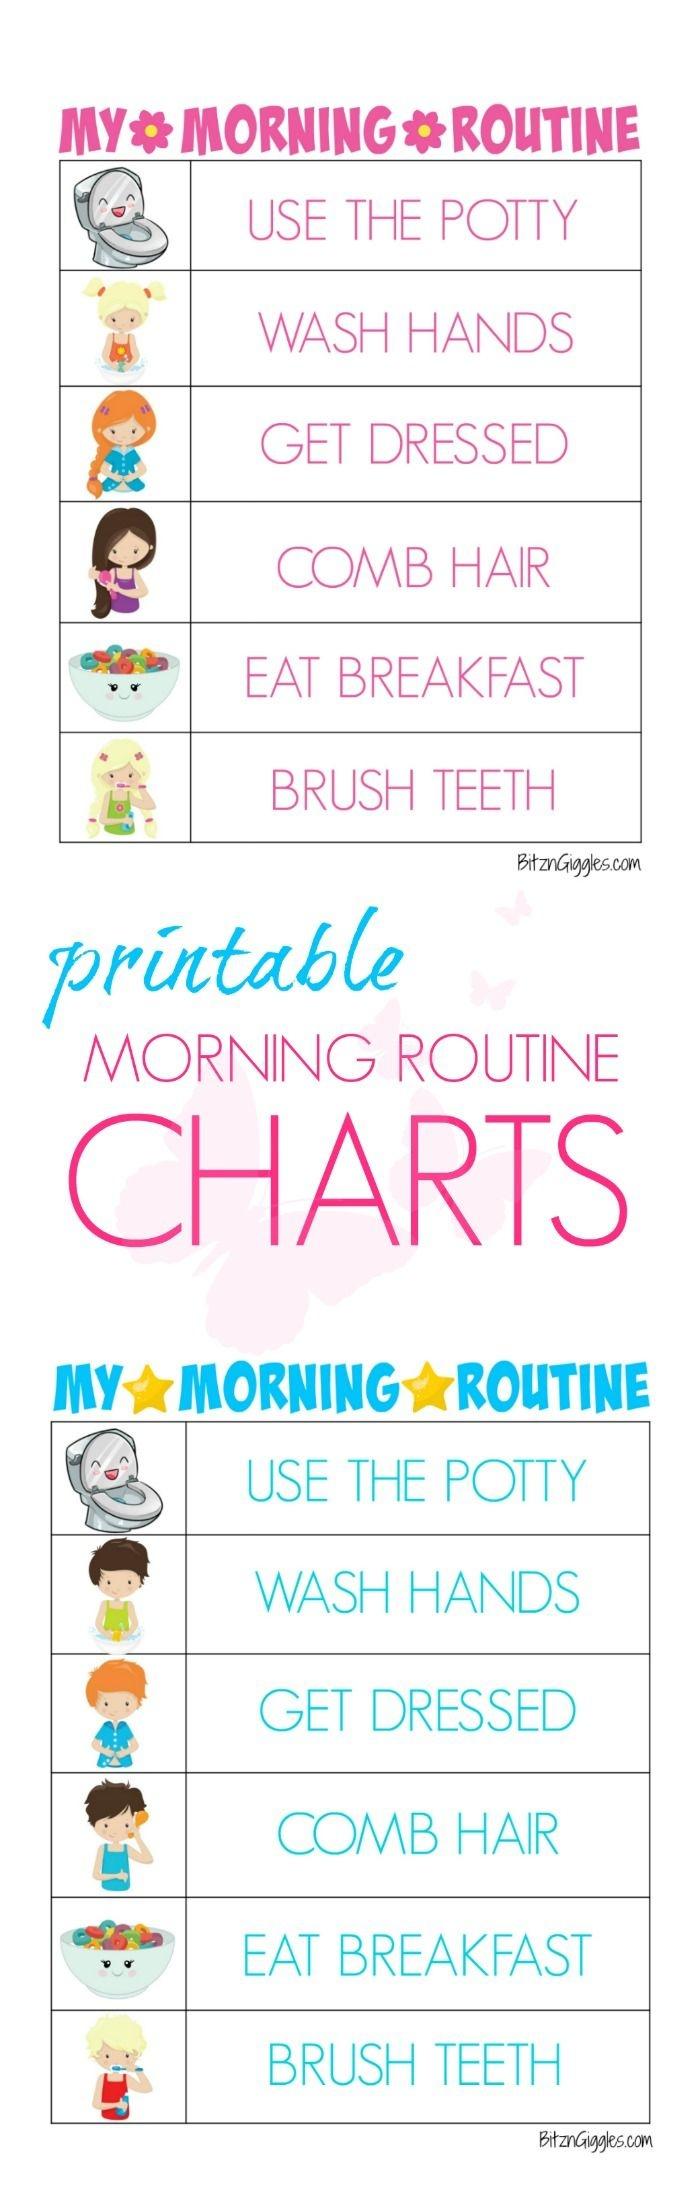 Printable Morning Routine Charts   Bloggers' Fun Family Projects - Free Printable Morning Routine Chart